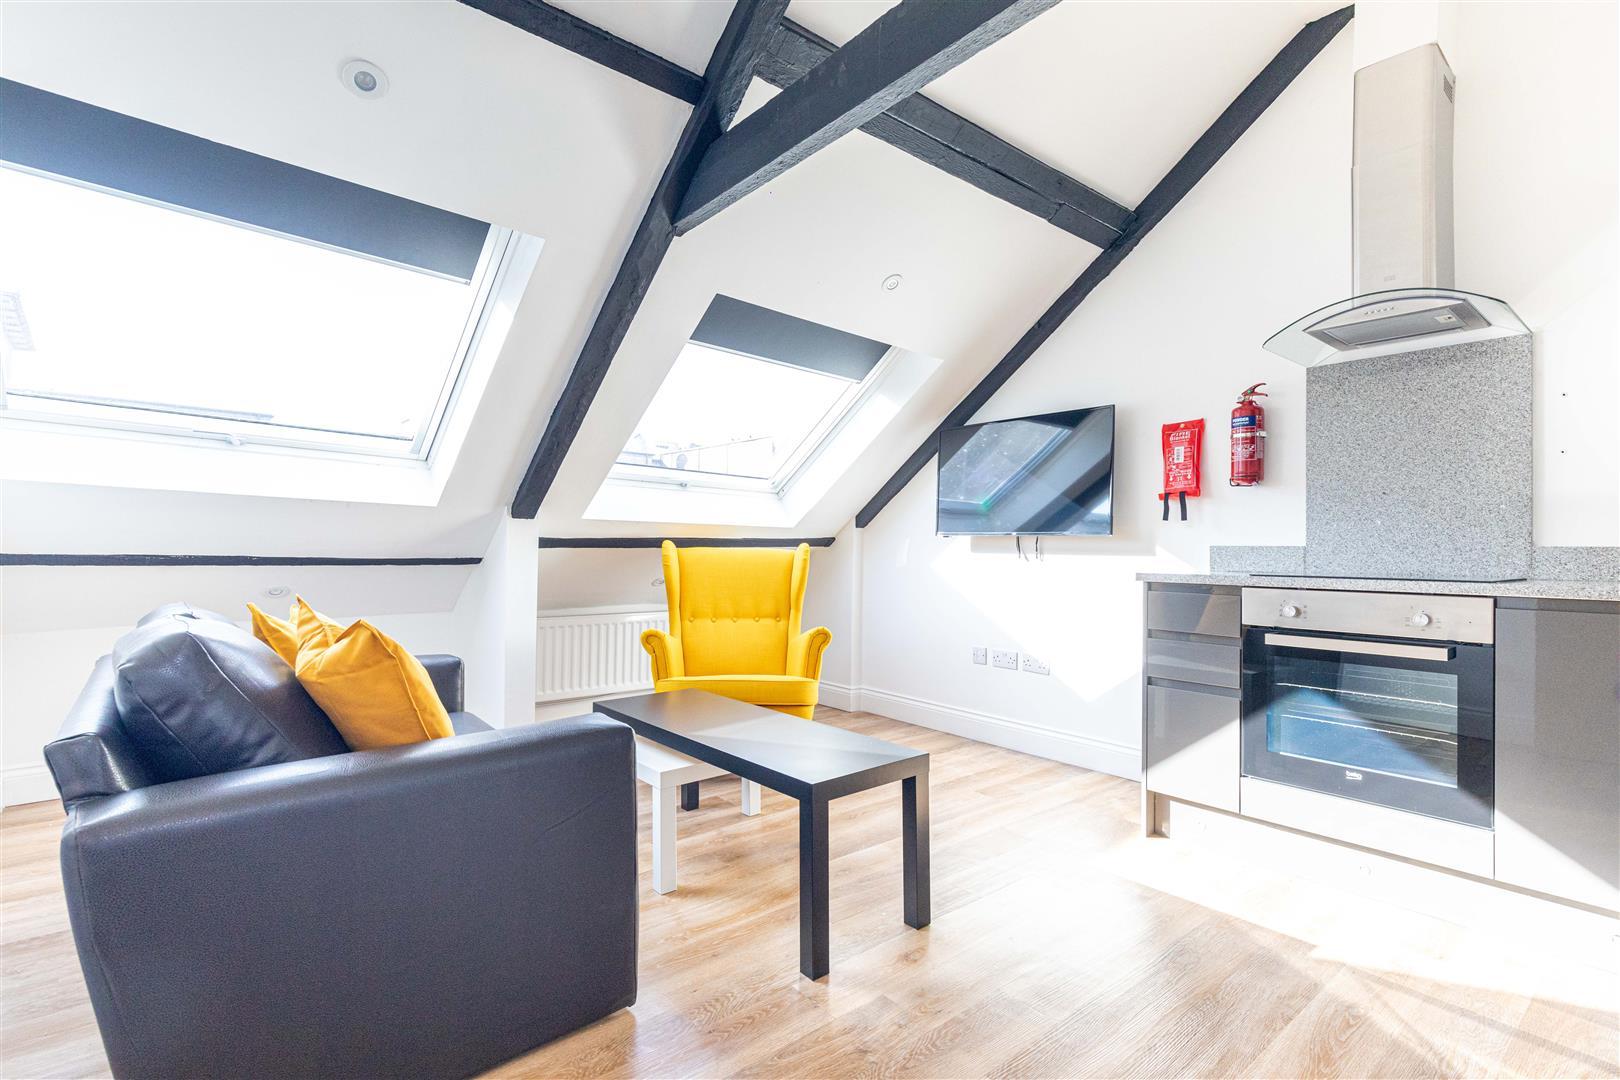 2 bed apartment to rent in Newcastle Upon Tyne, NE1 8JN, NE1